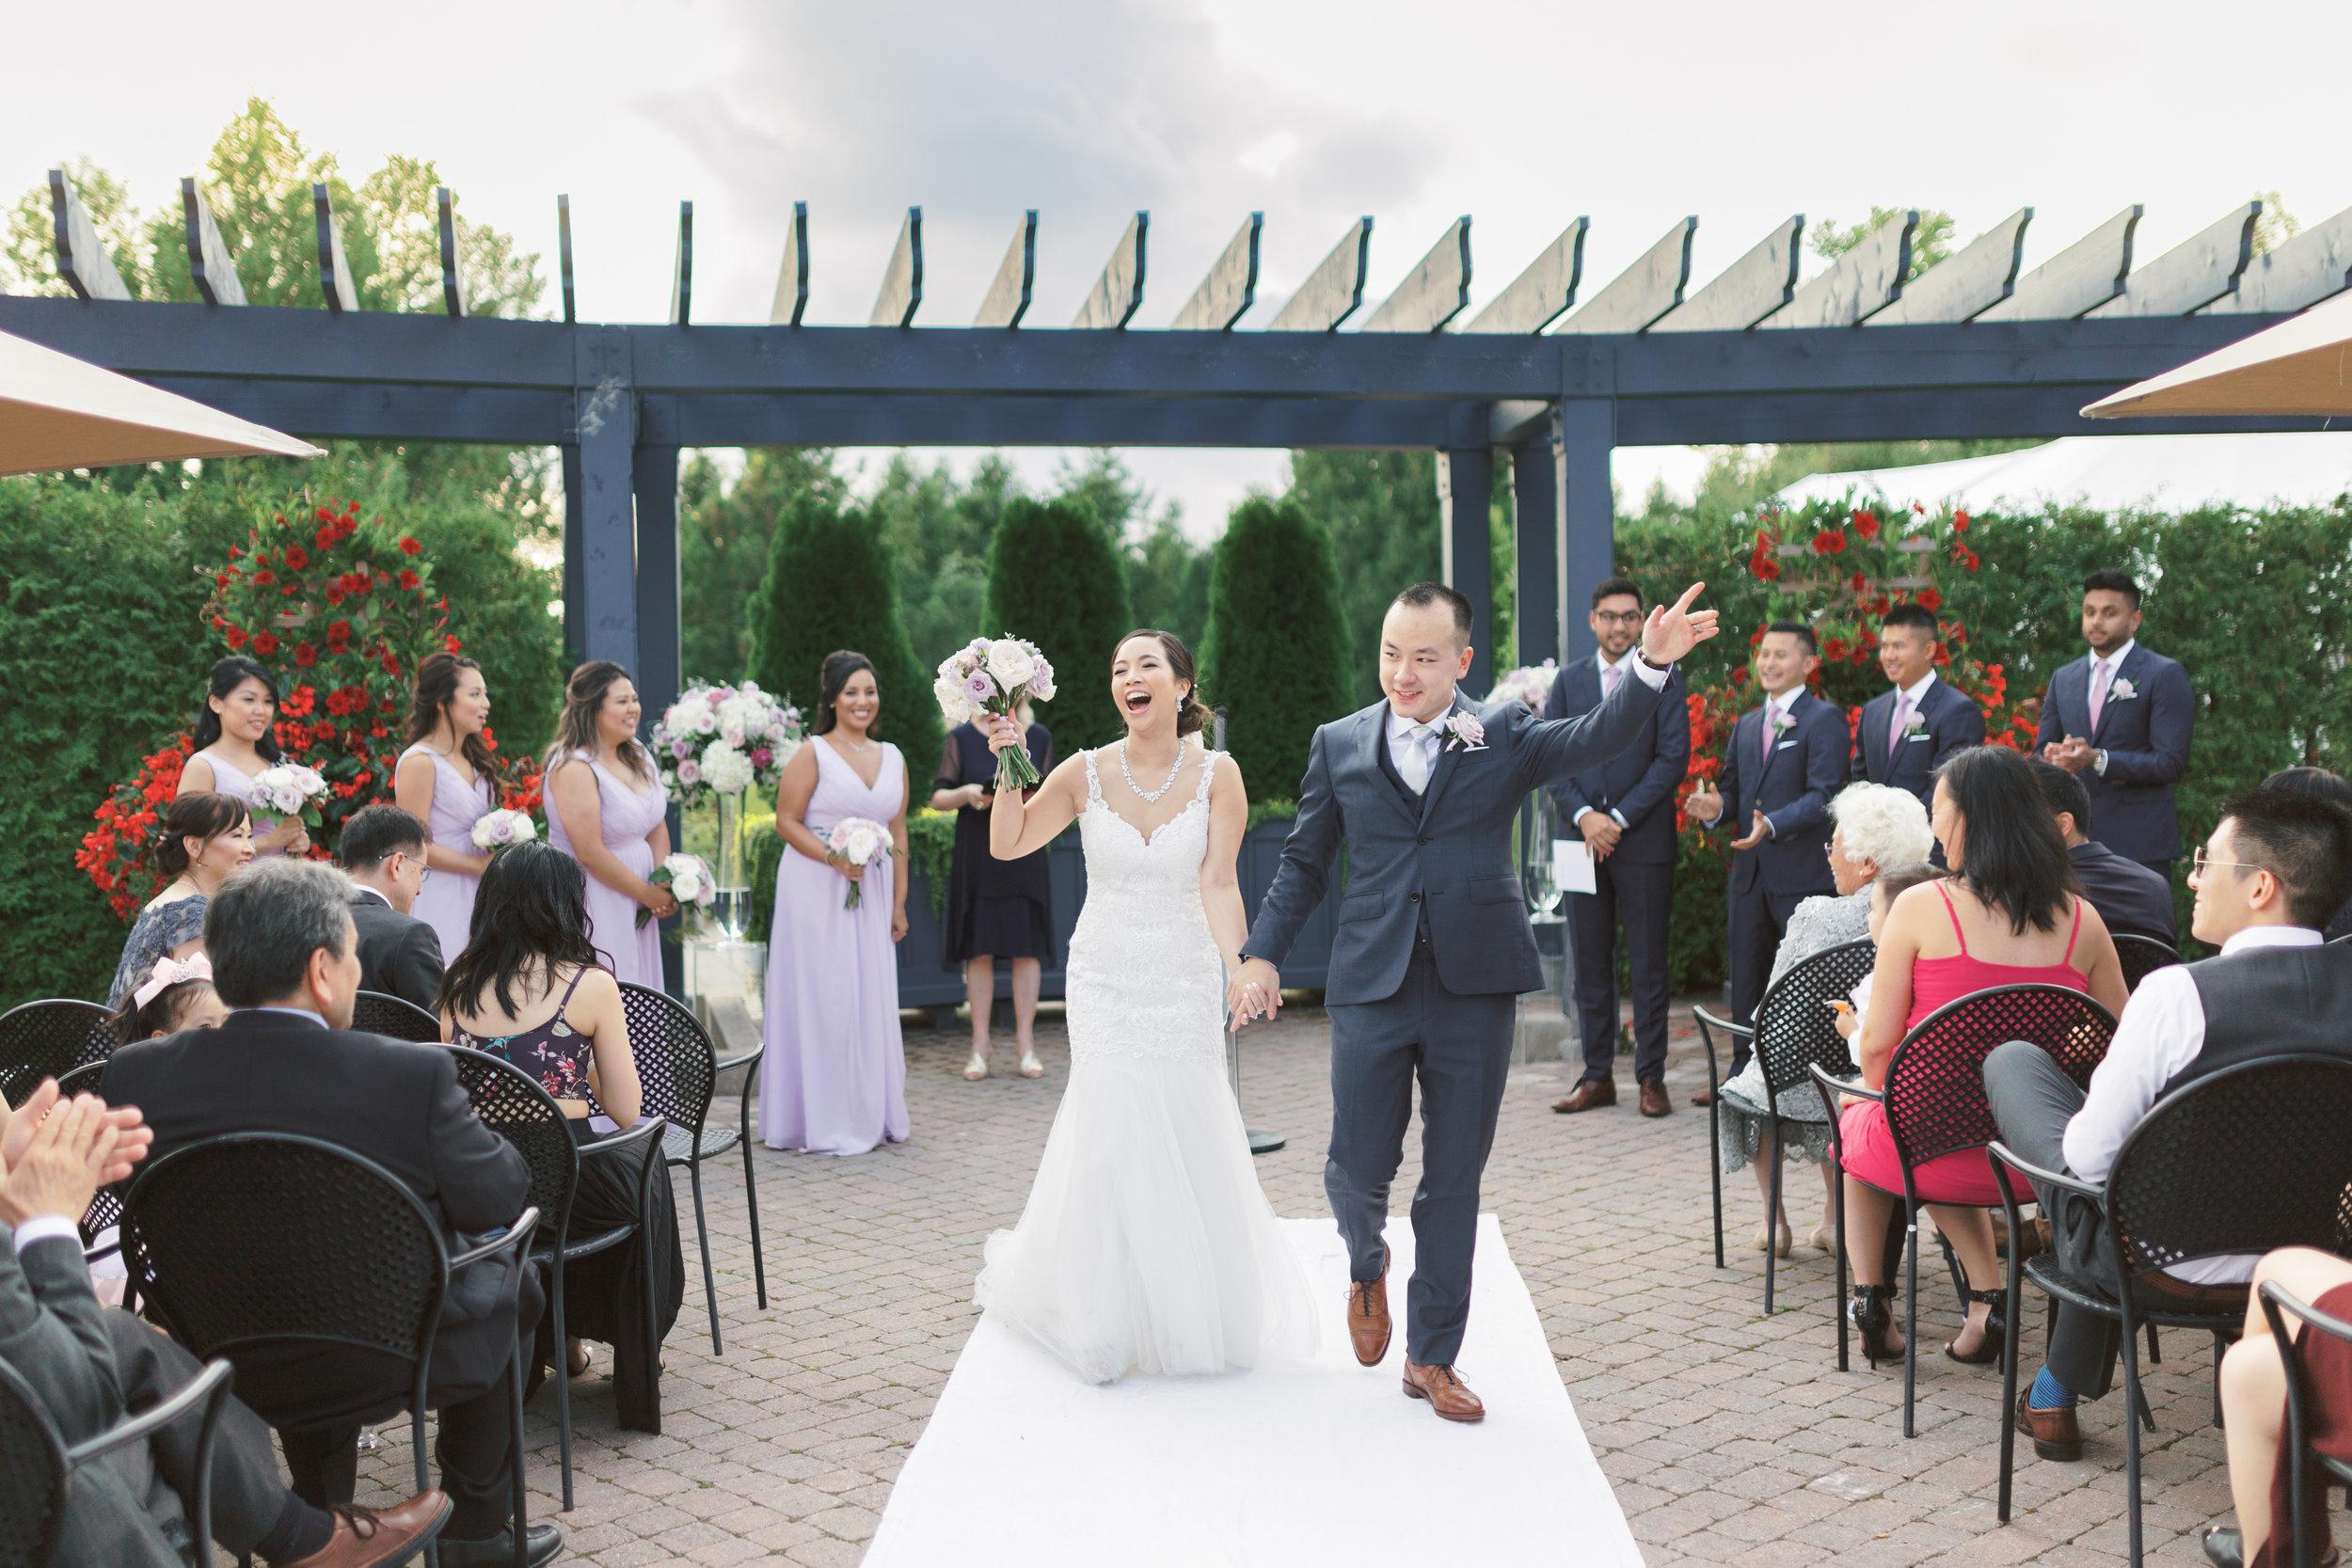 Angus Glen Wedding - Ceremony-101.jpg